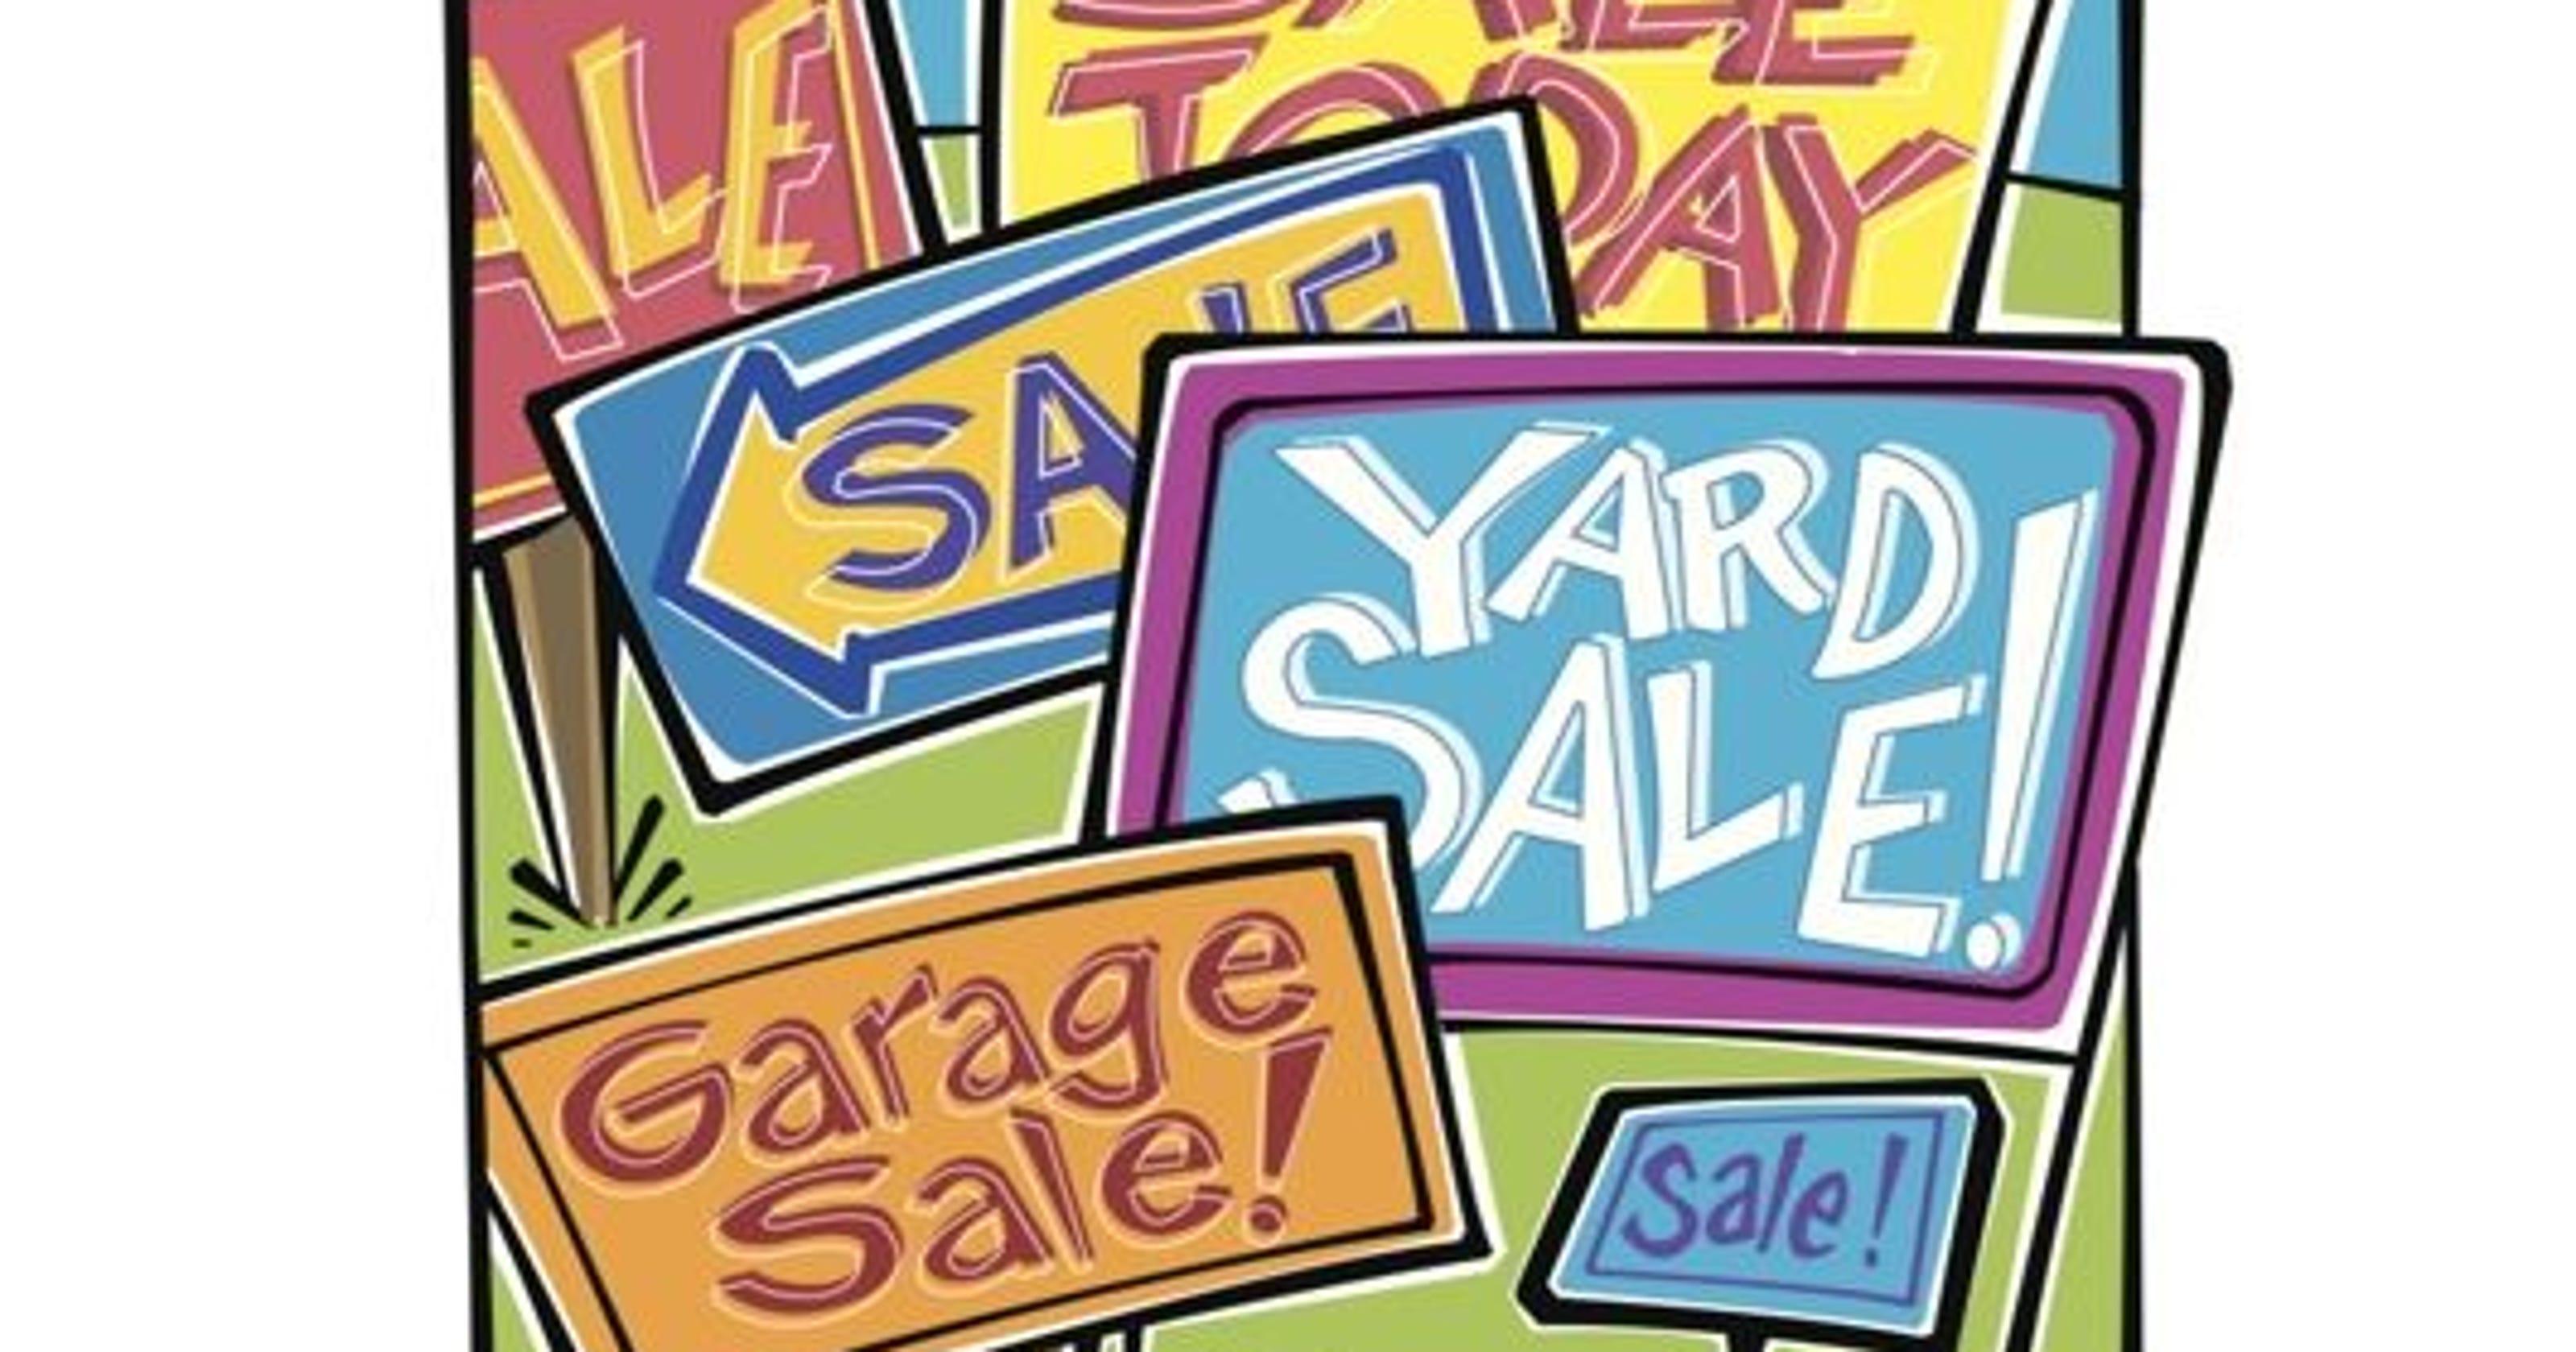 Free garage sale ad package